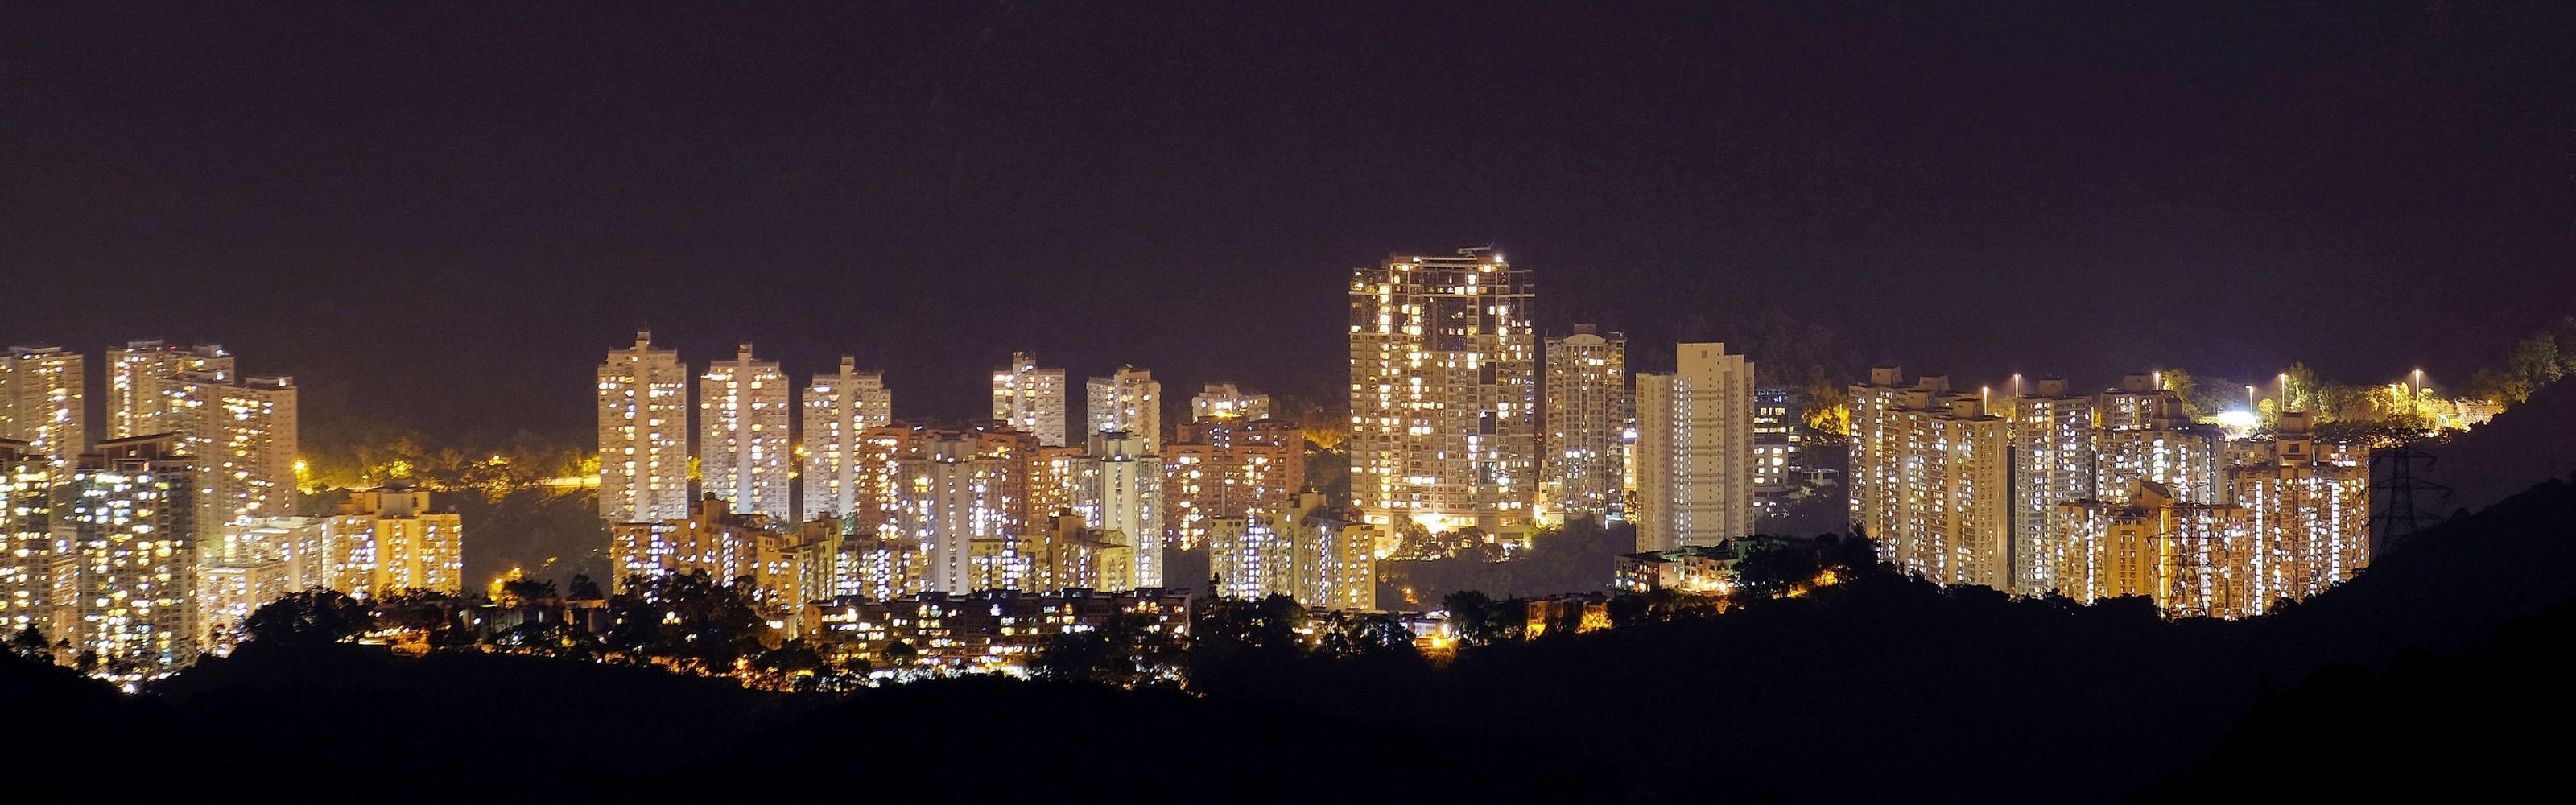 surrounded by the expanse of urban Hong Kong. Image taken in Tai Mo Shan.